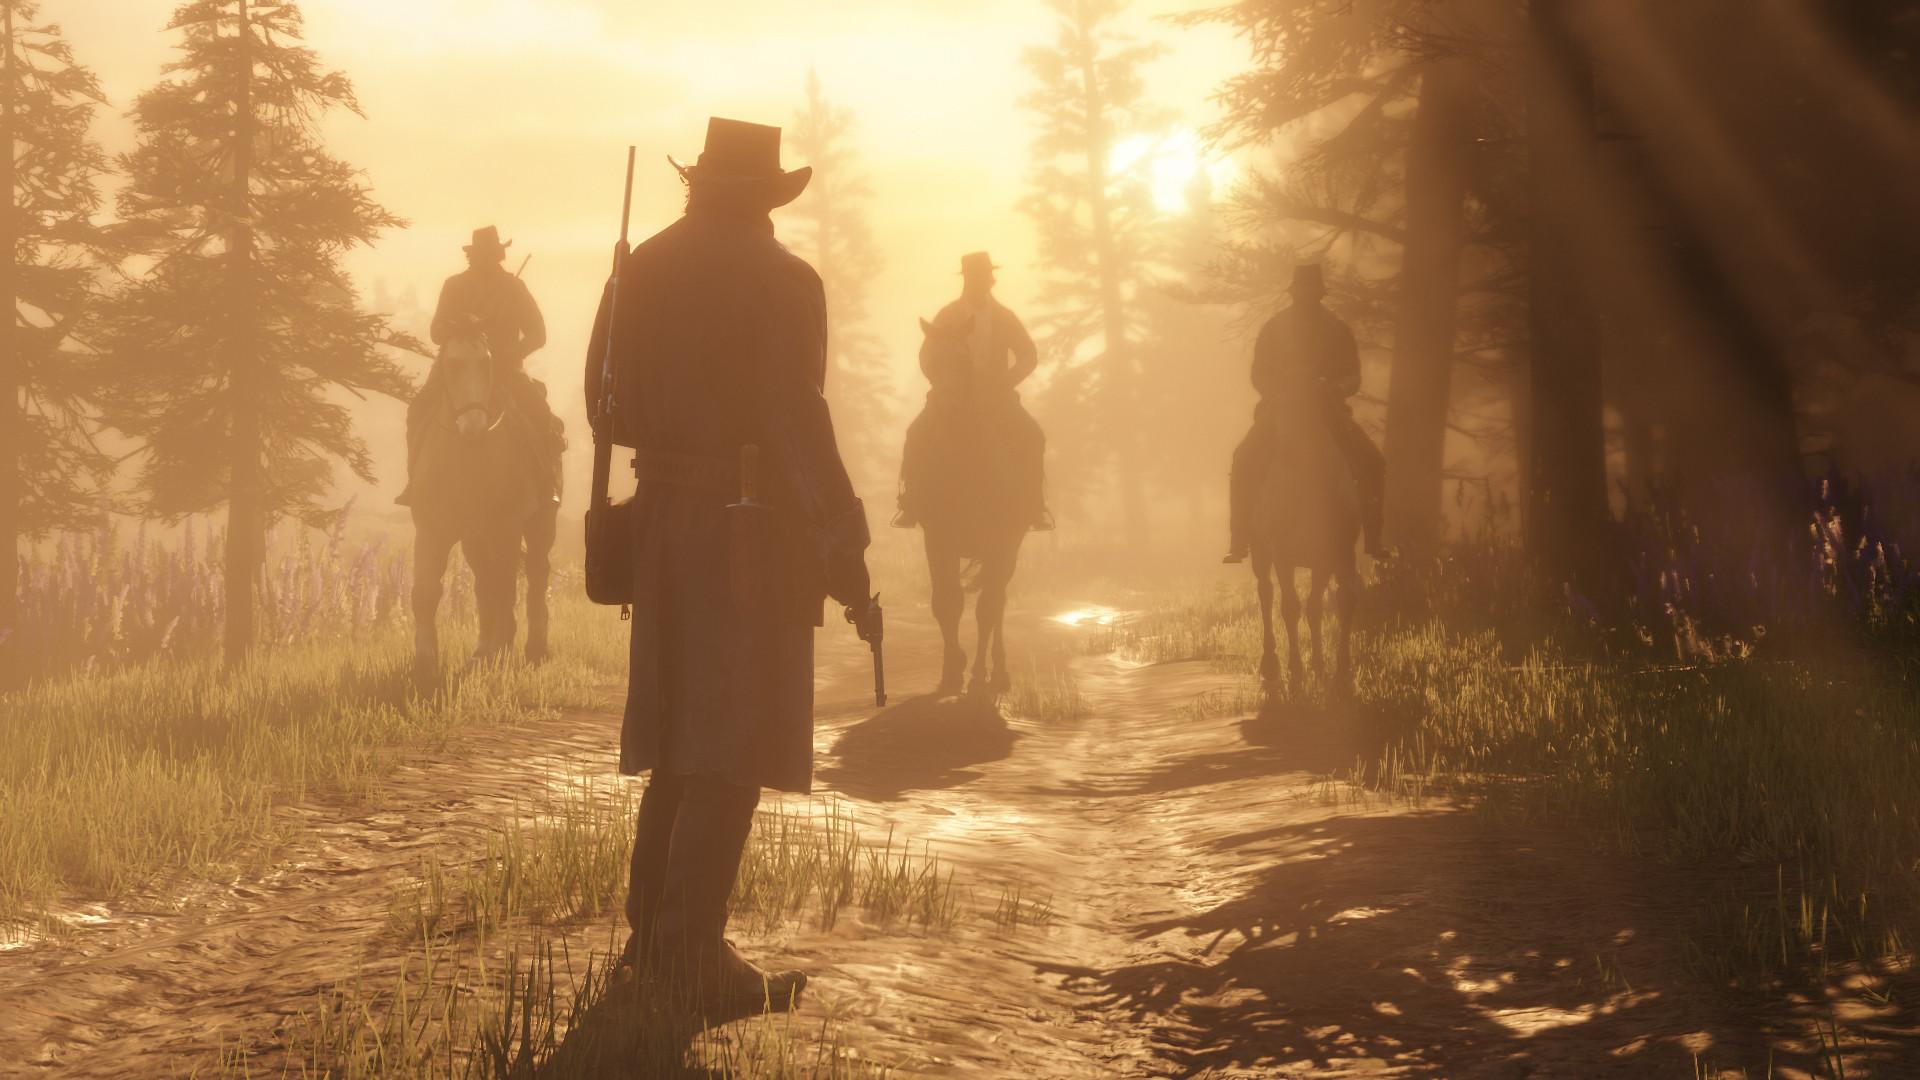 Объявлена дата выхода Red Dead Redemption 2. Опубликованы новые скриншоты